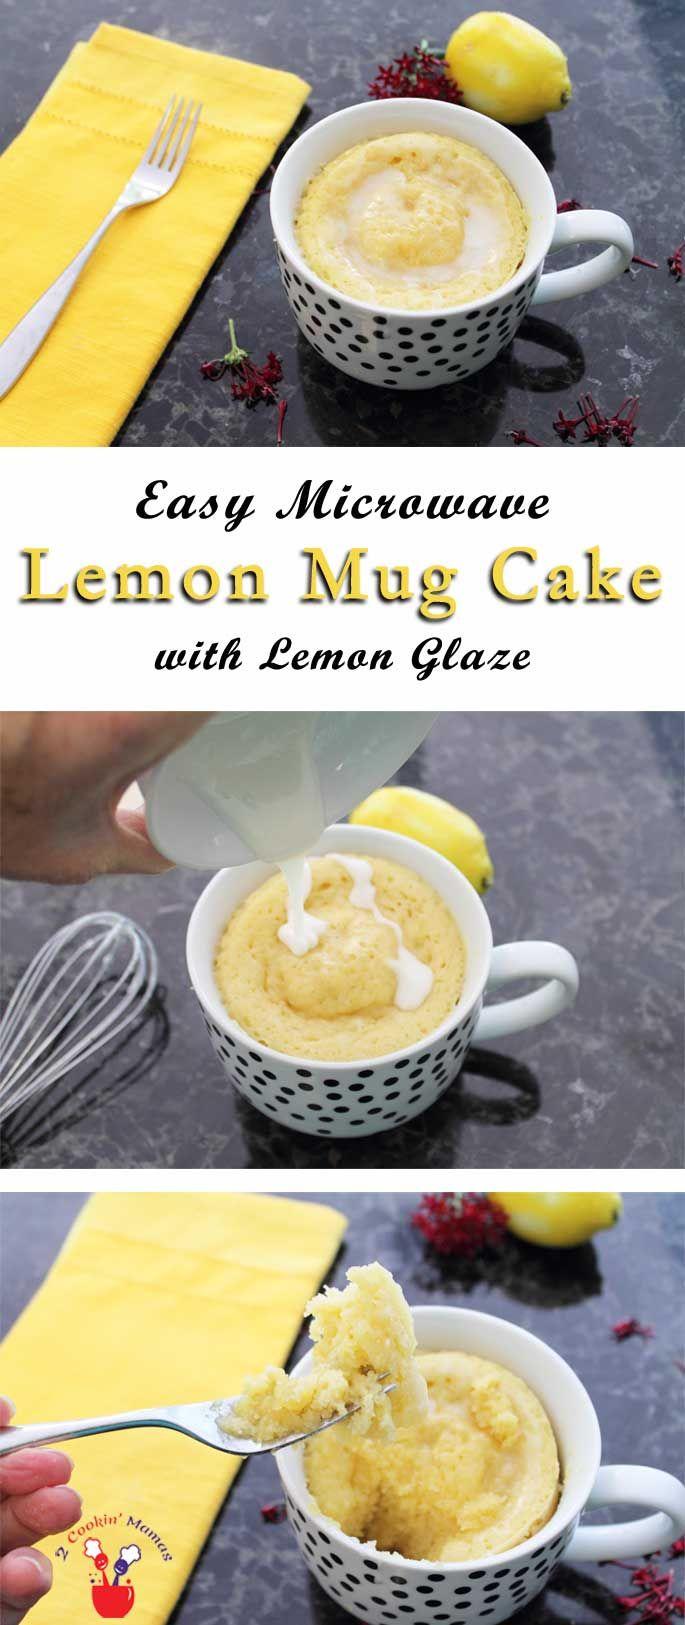 Easy microwave lemon mug cake with lemon glaze #mugcake